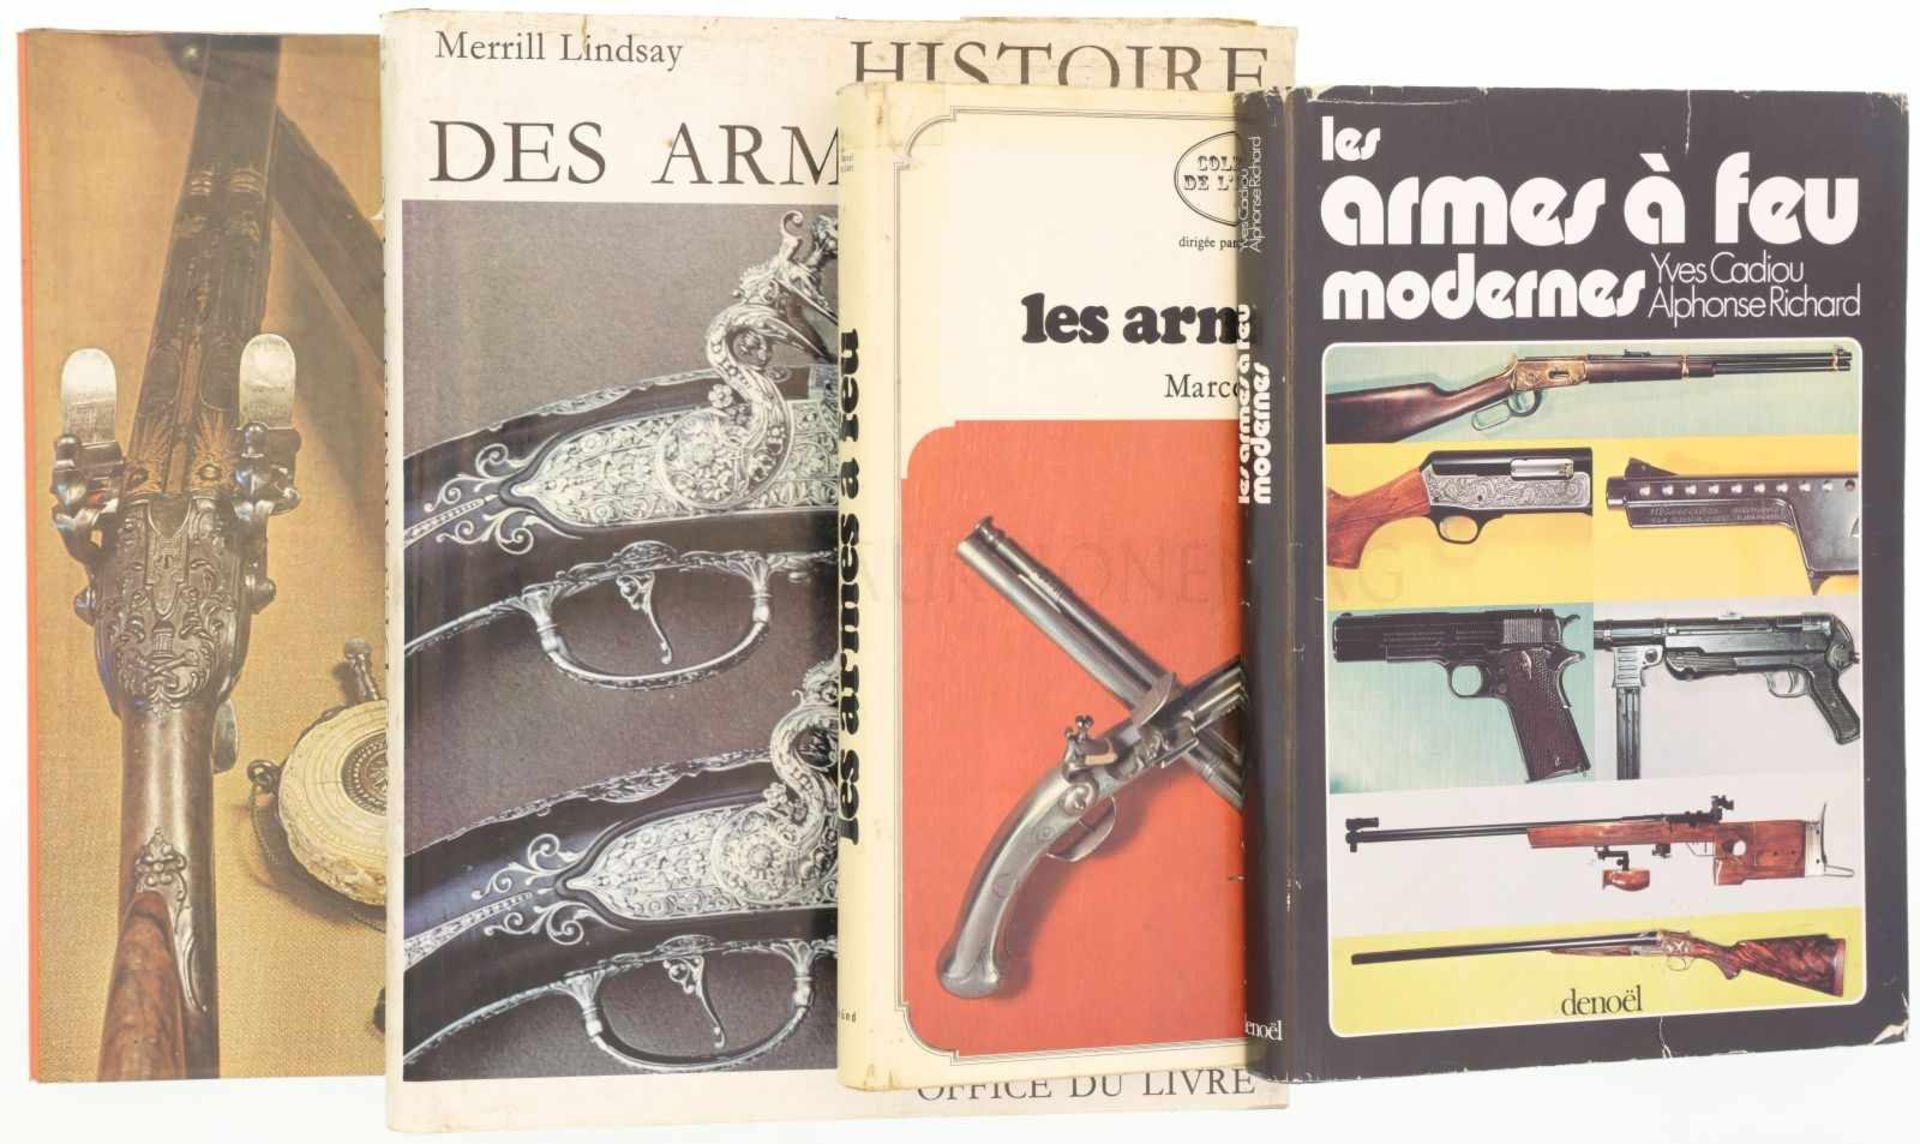 "Konvolut von 4 Büchern ""armes a feu"" 1. Les armes a feu modernes, Autoren Yves Cadiou und Alphonse"